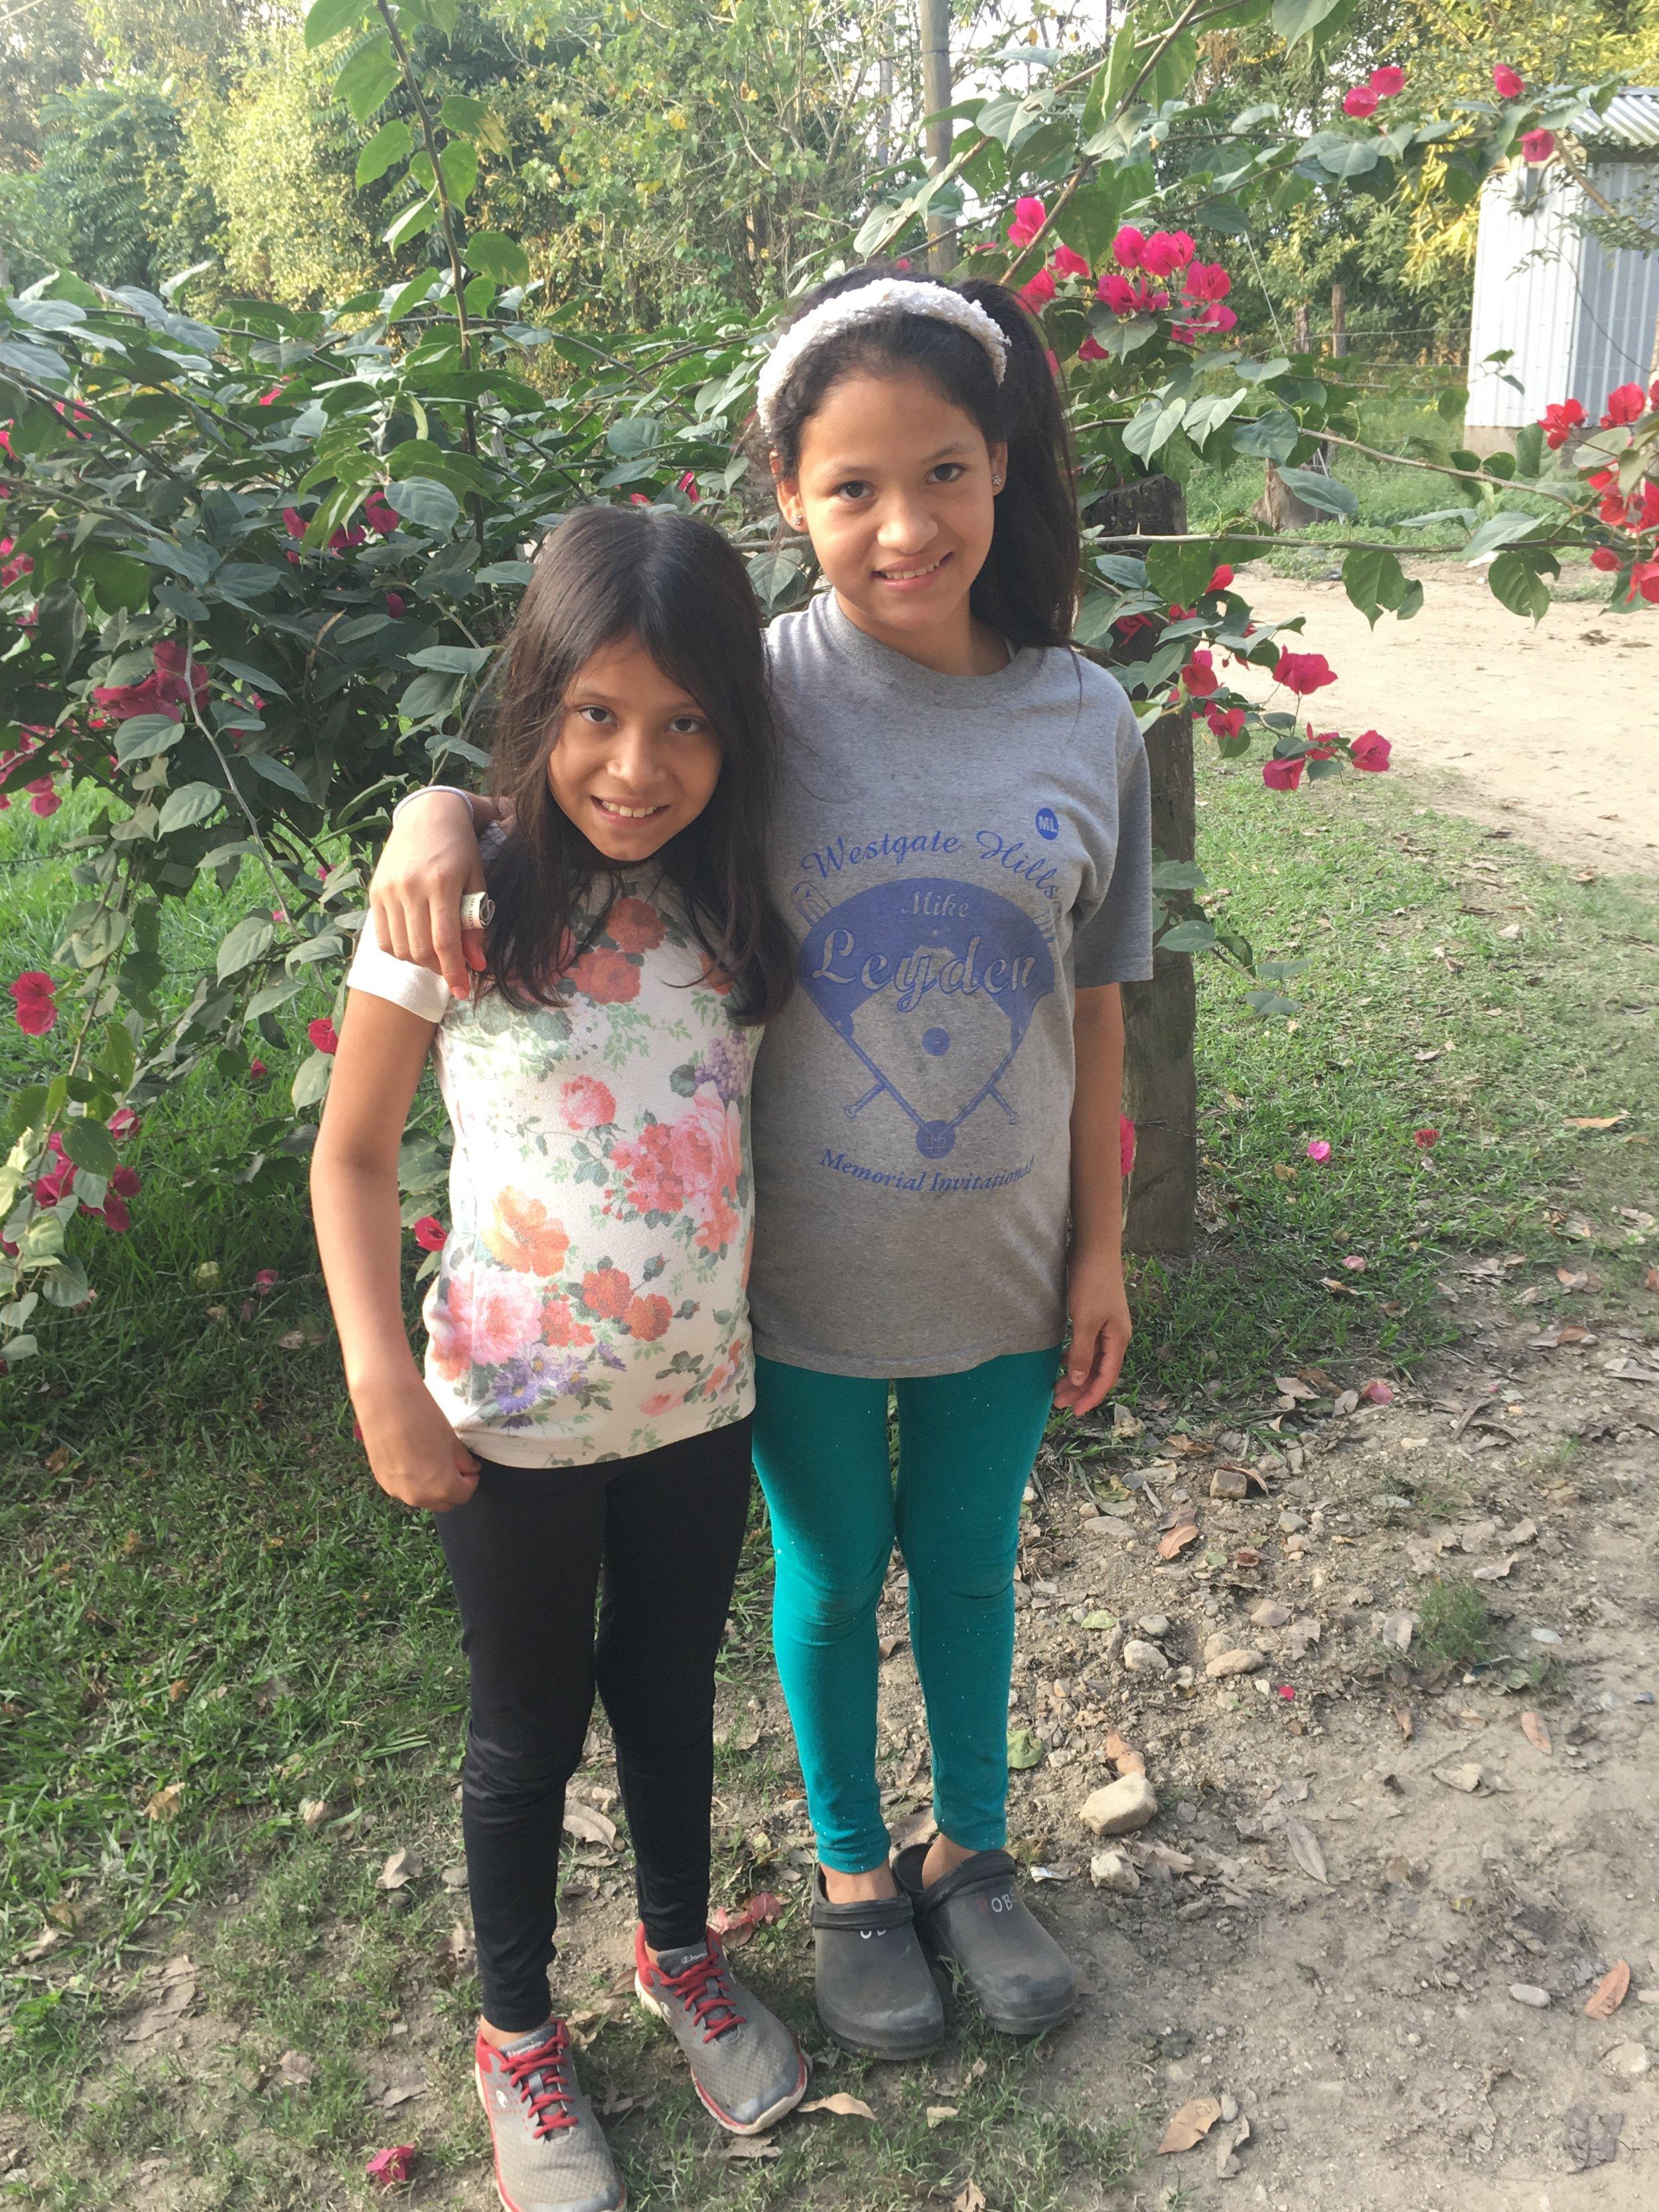 Enjoying a birthday walk with her sister.